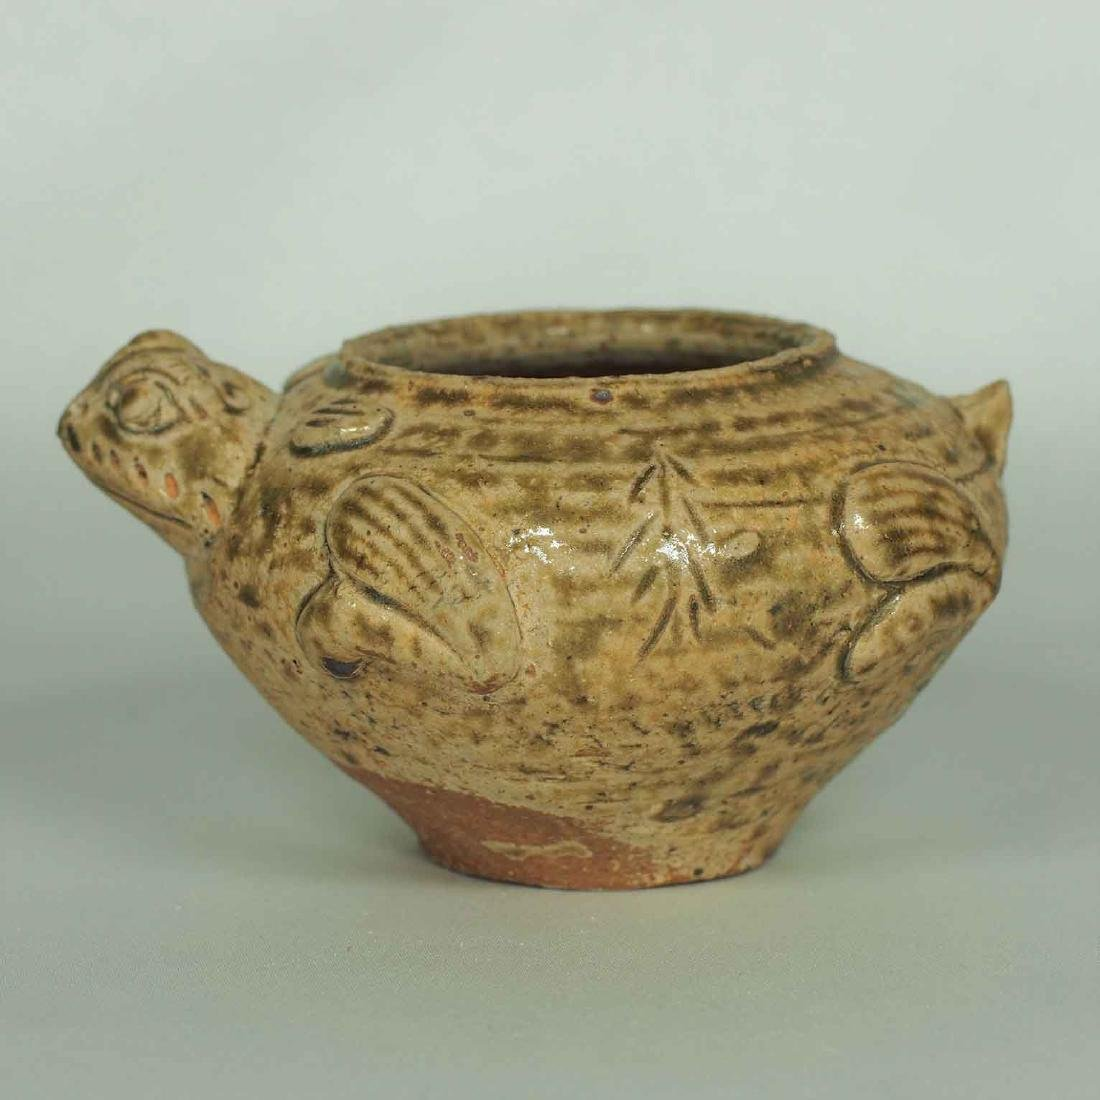 Proto-Porcelain Turtle-Form Water Pot, Han Dynasty - 3